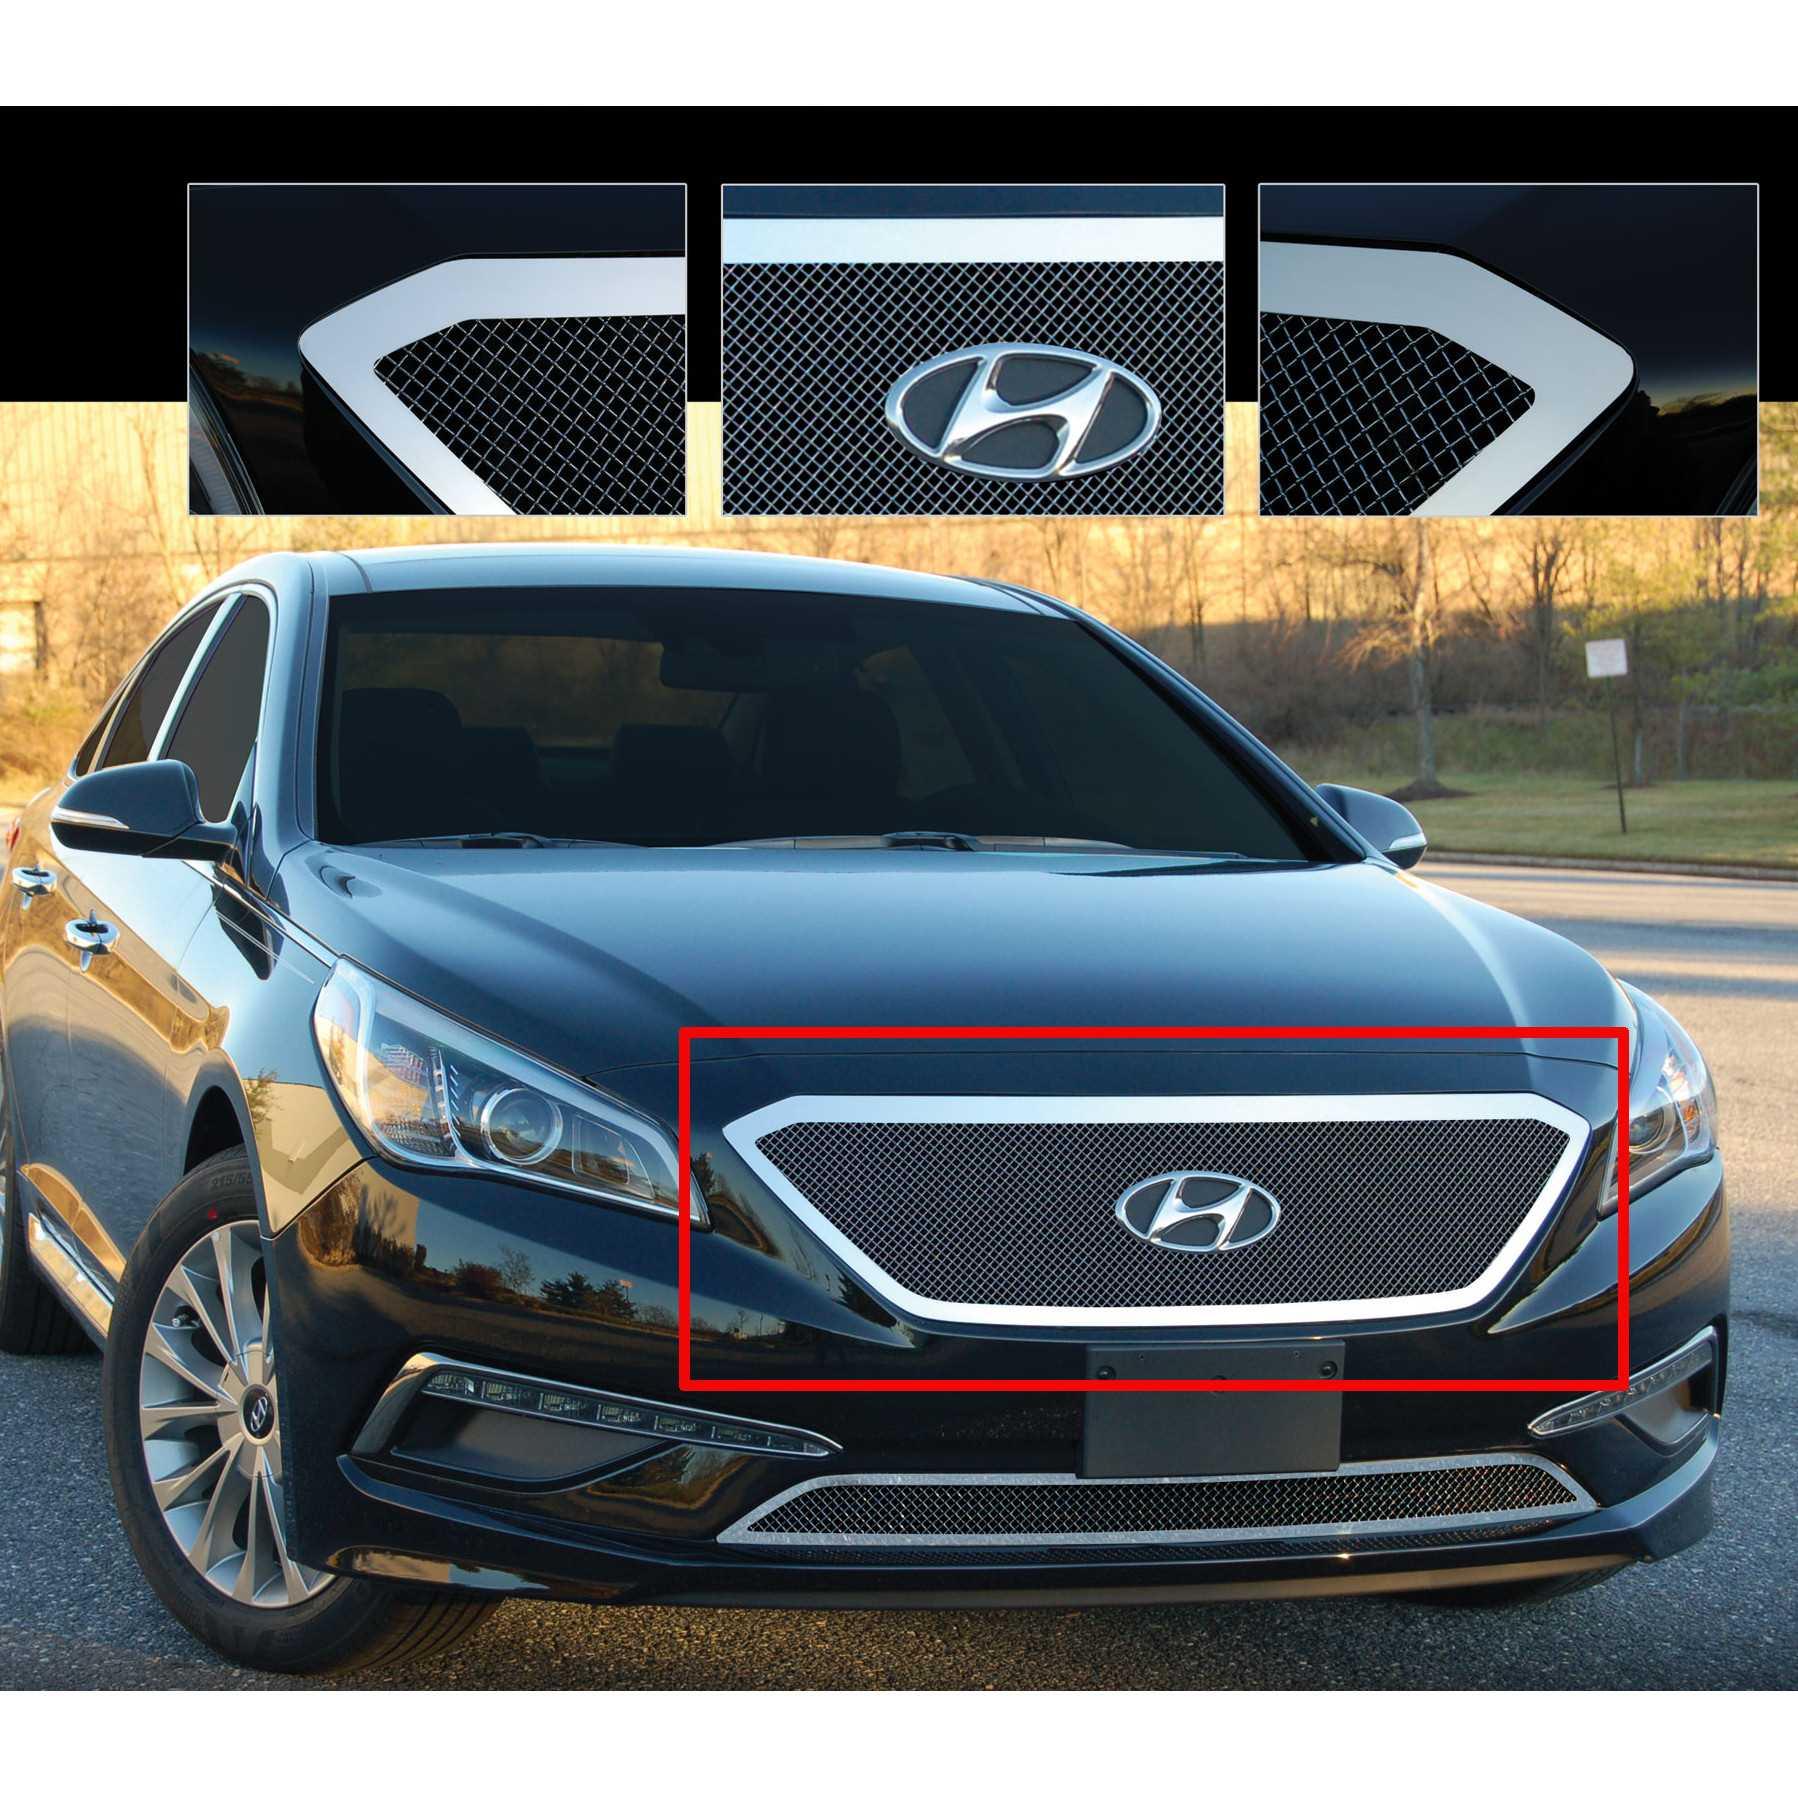 E G Clics 2017 2016 Hyundai Sonata Grille Upper Black Ice Fine Mesh 1221 B10u 15